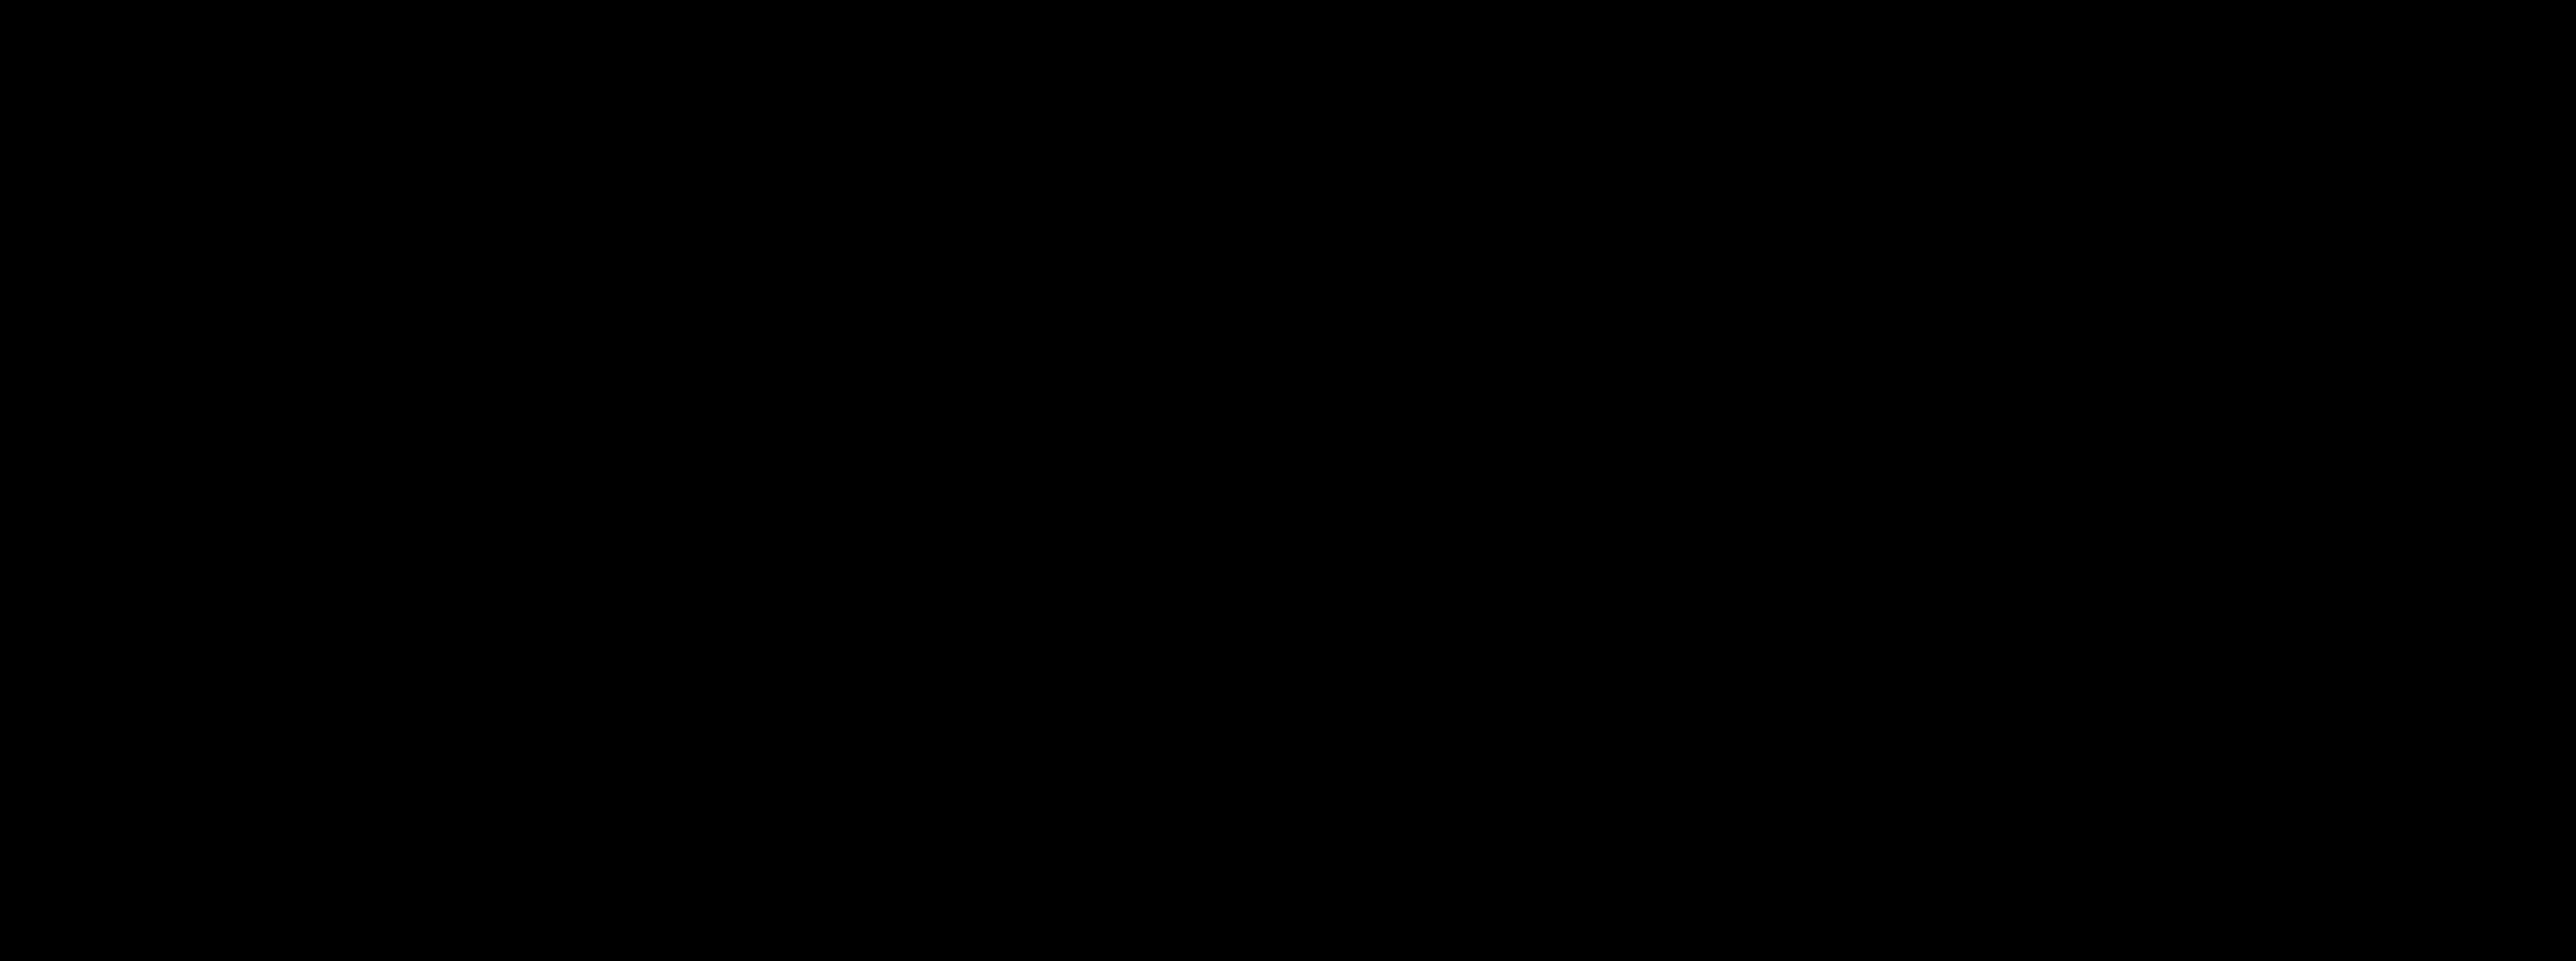 Biotinamidocaproate tobramycin amide